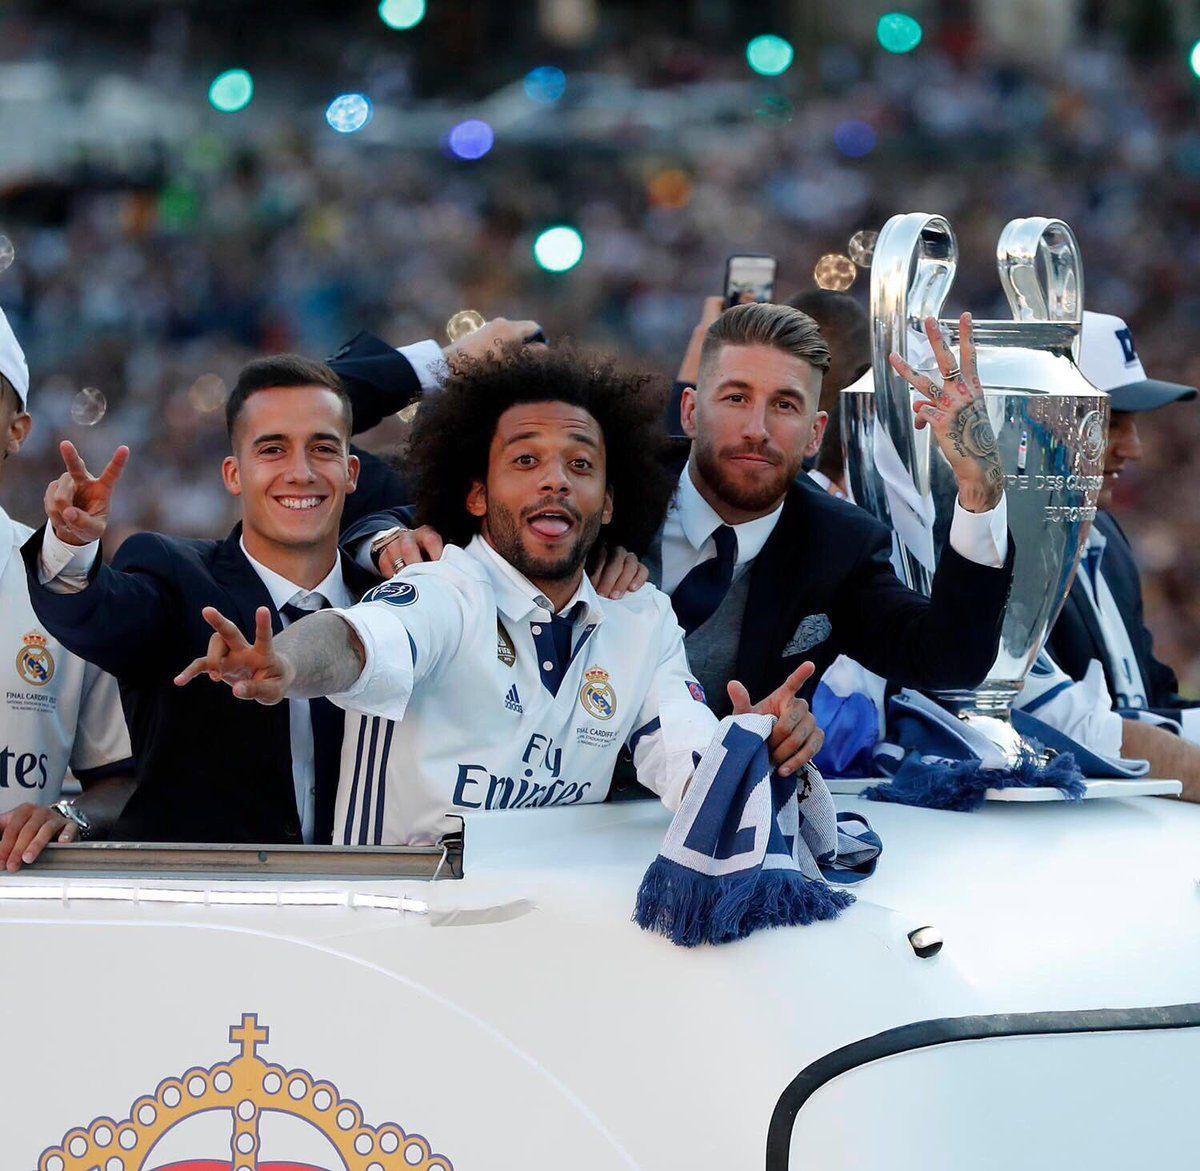 Pin By Joey Lee On Yeeaaaahhh Real Real Madrid Photos Real Madrid Team Real Madrid